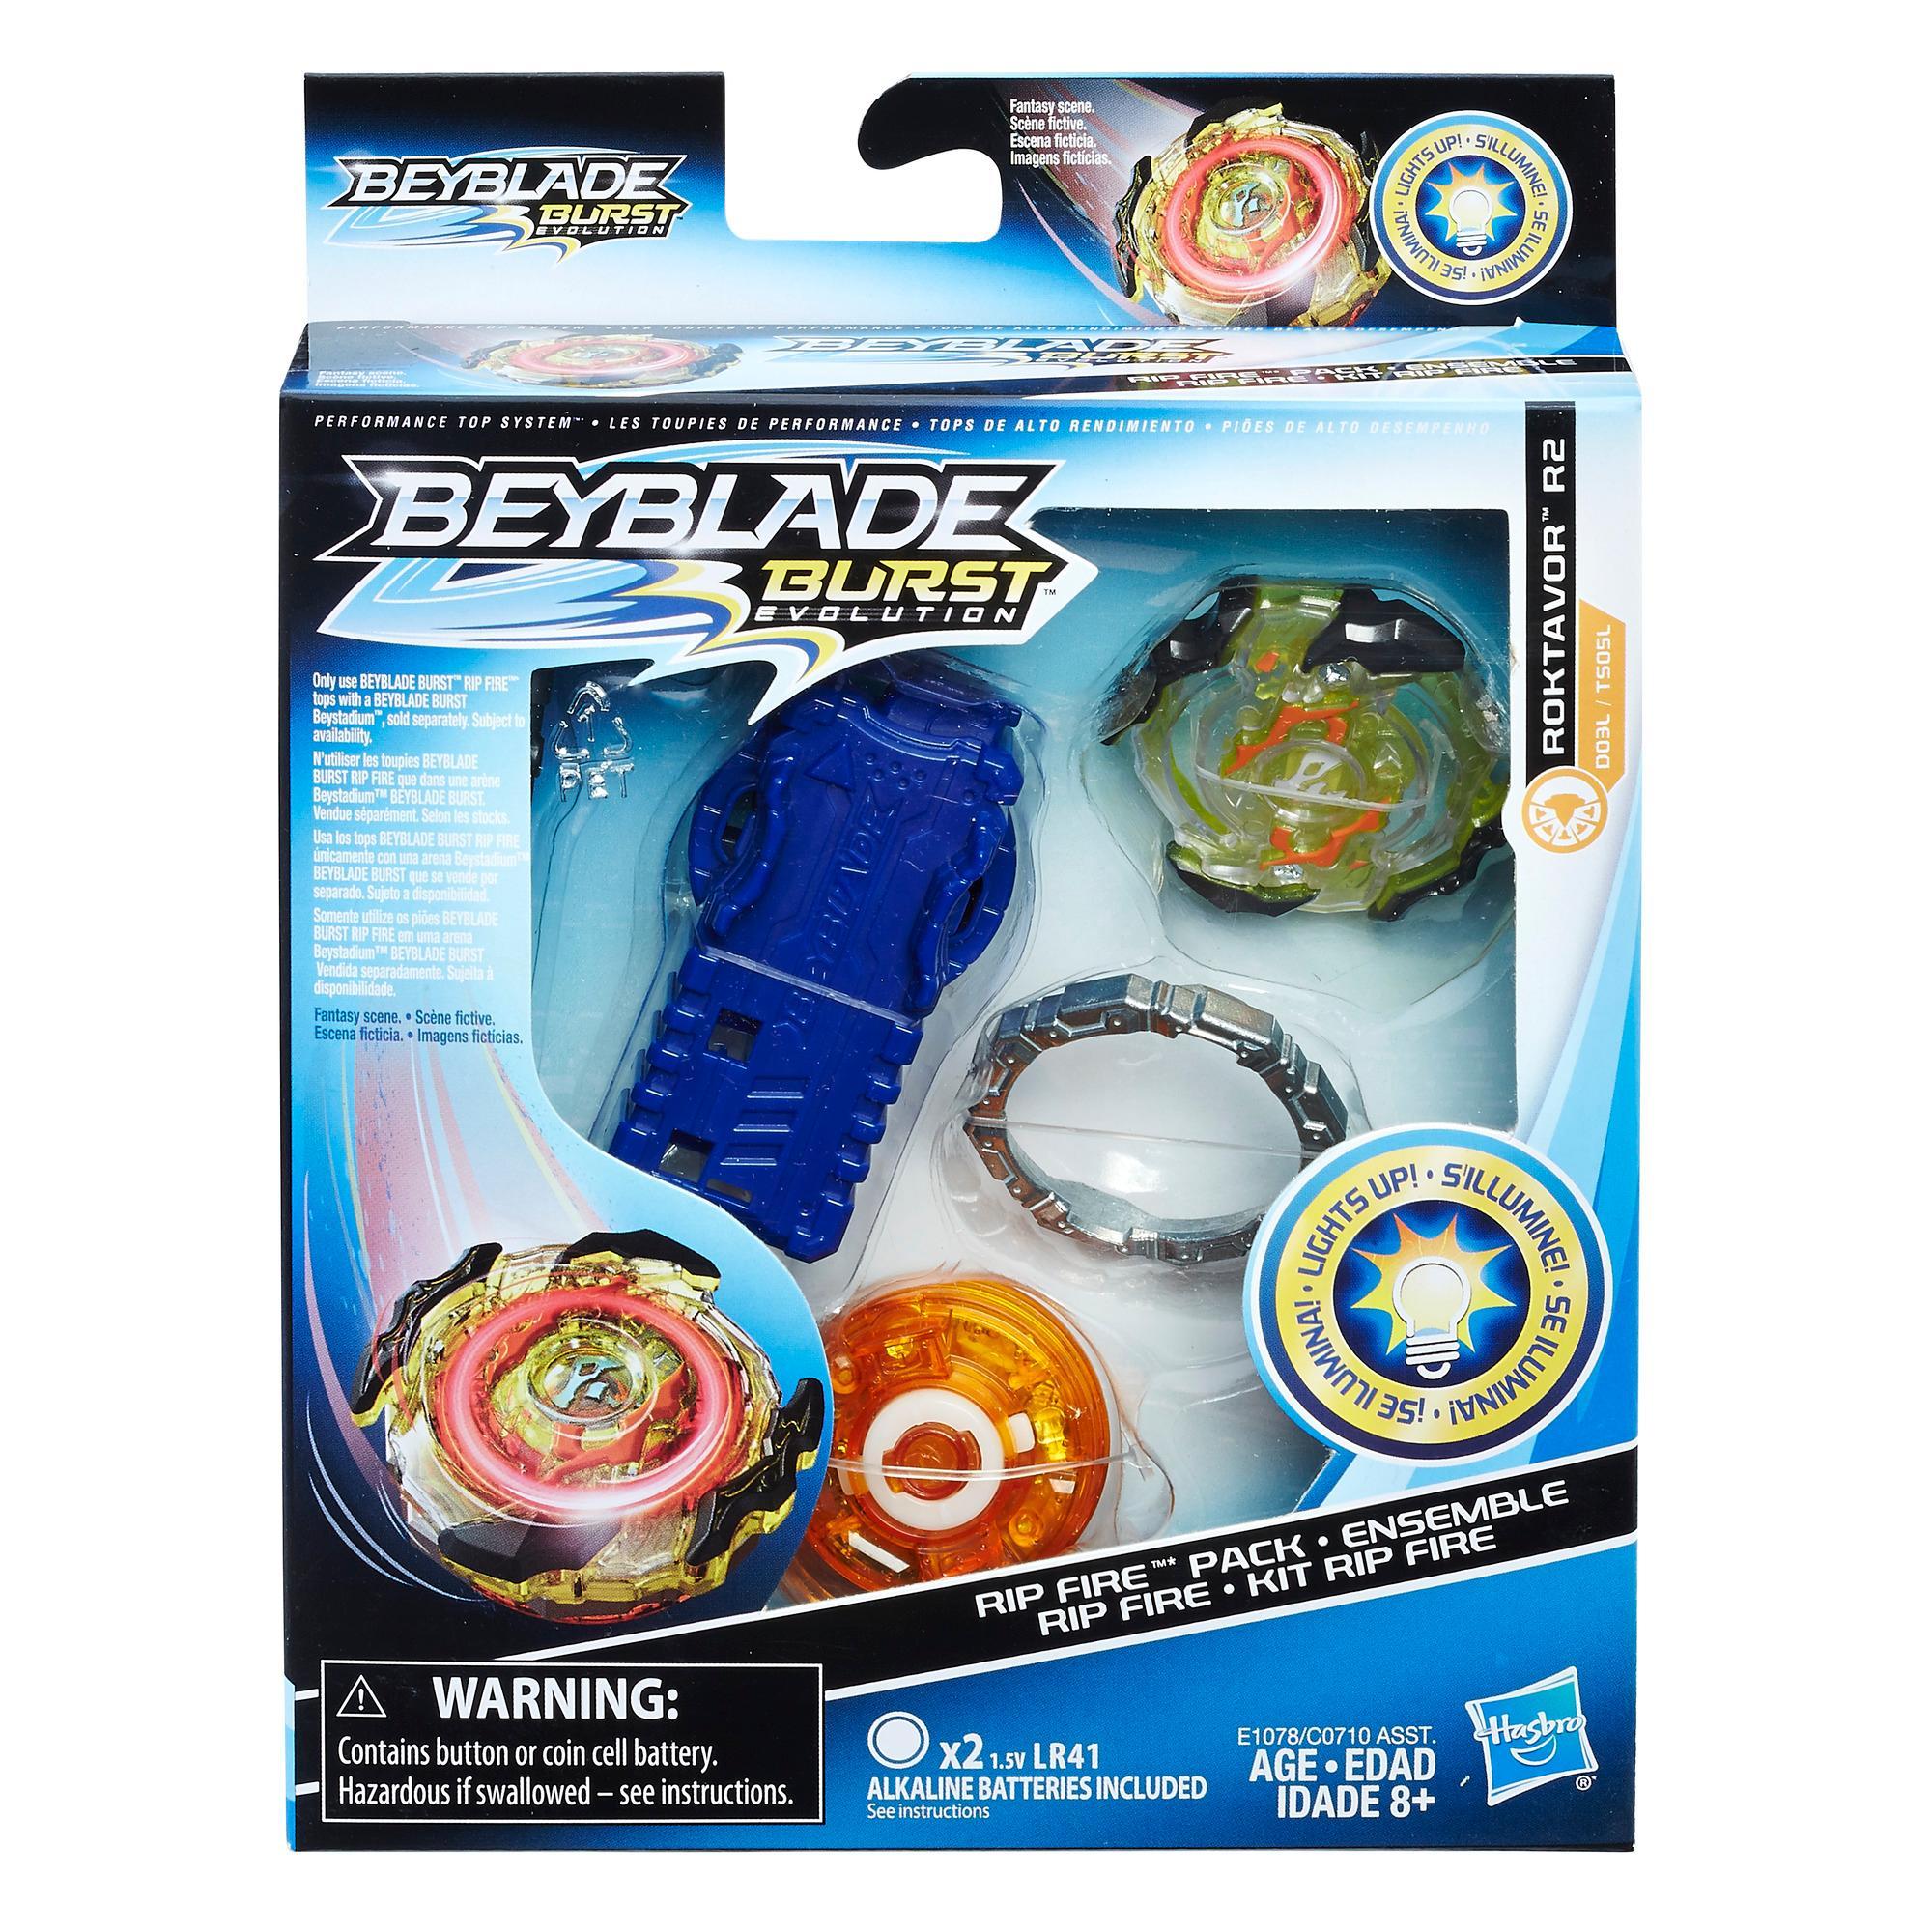 Beyblade Burst Evolution Rip Fire Starter Pack Roktavor R2